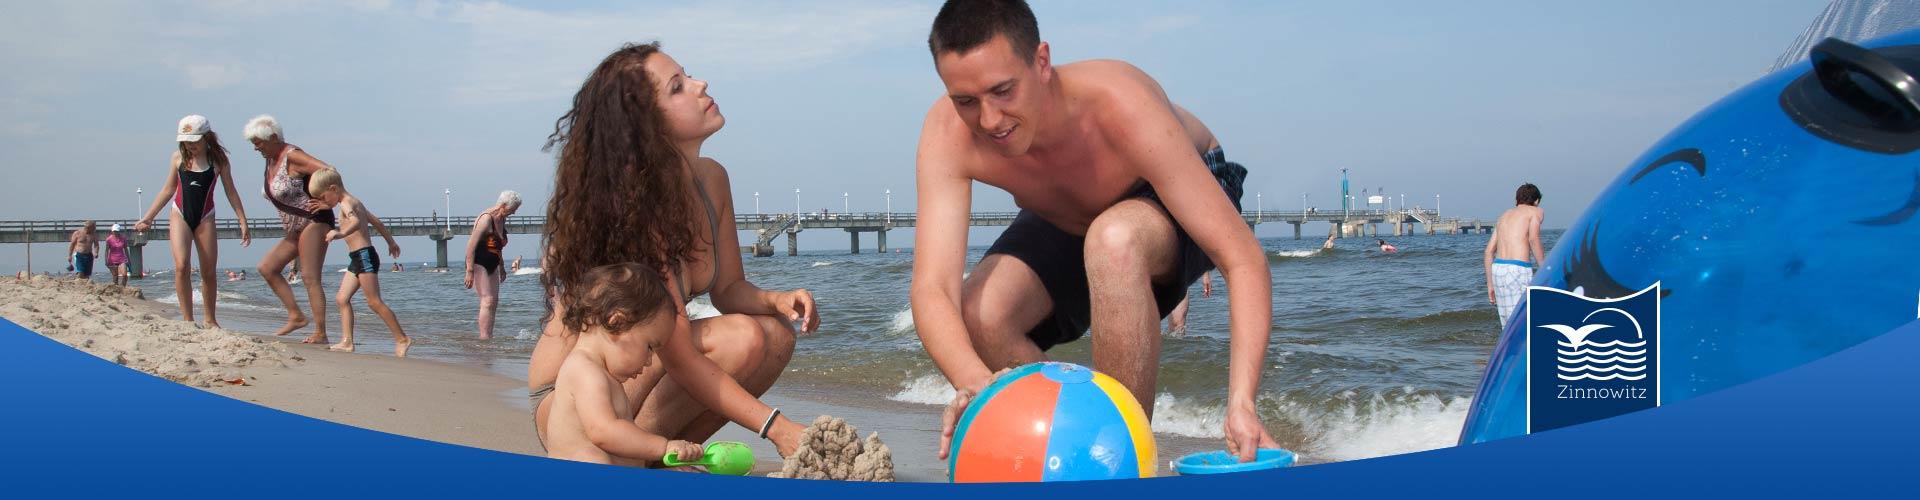 Seebrücke Ostseebad Zinnowitz mit Familie am Strand